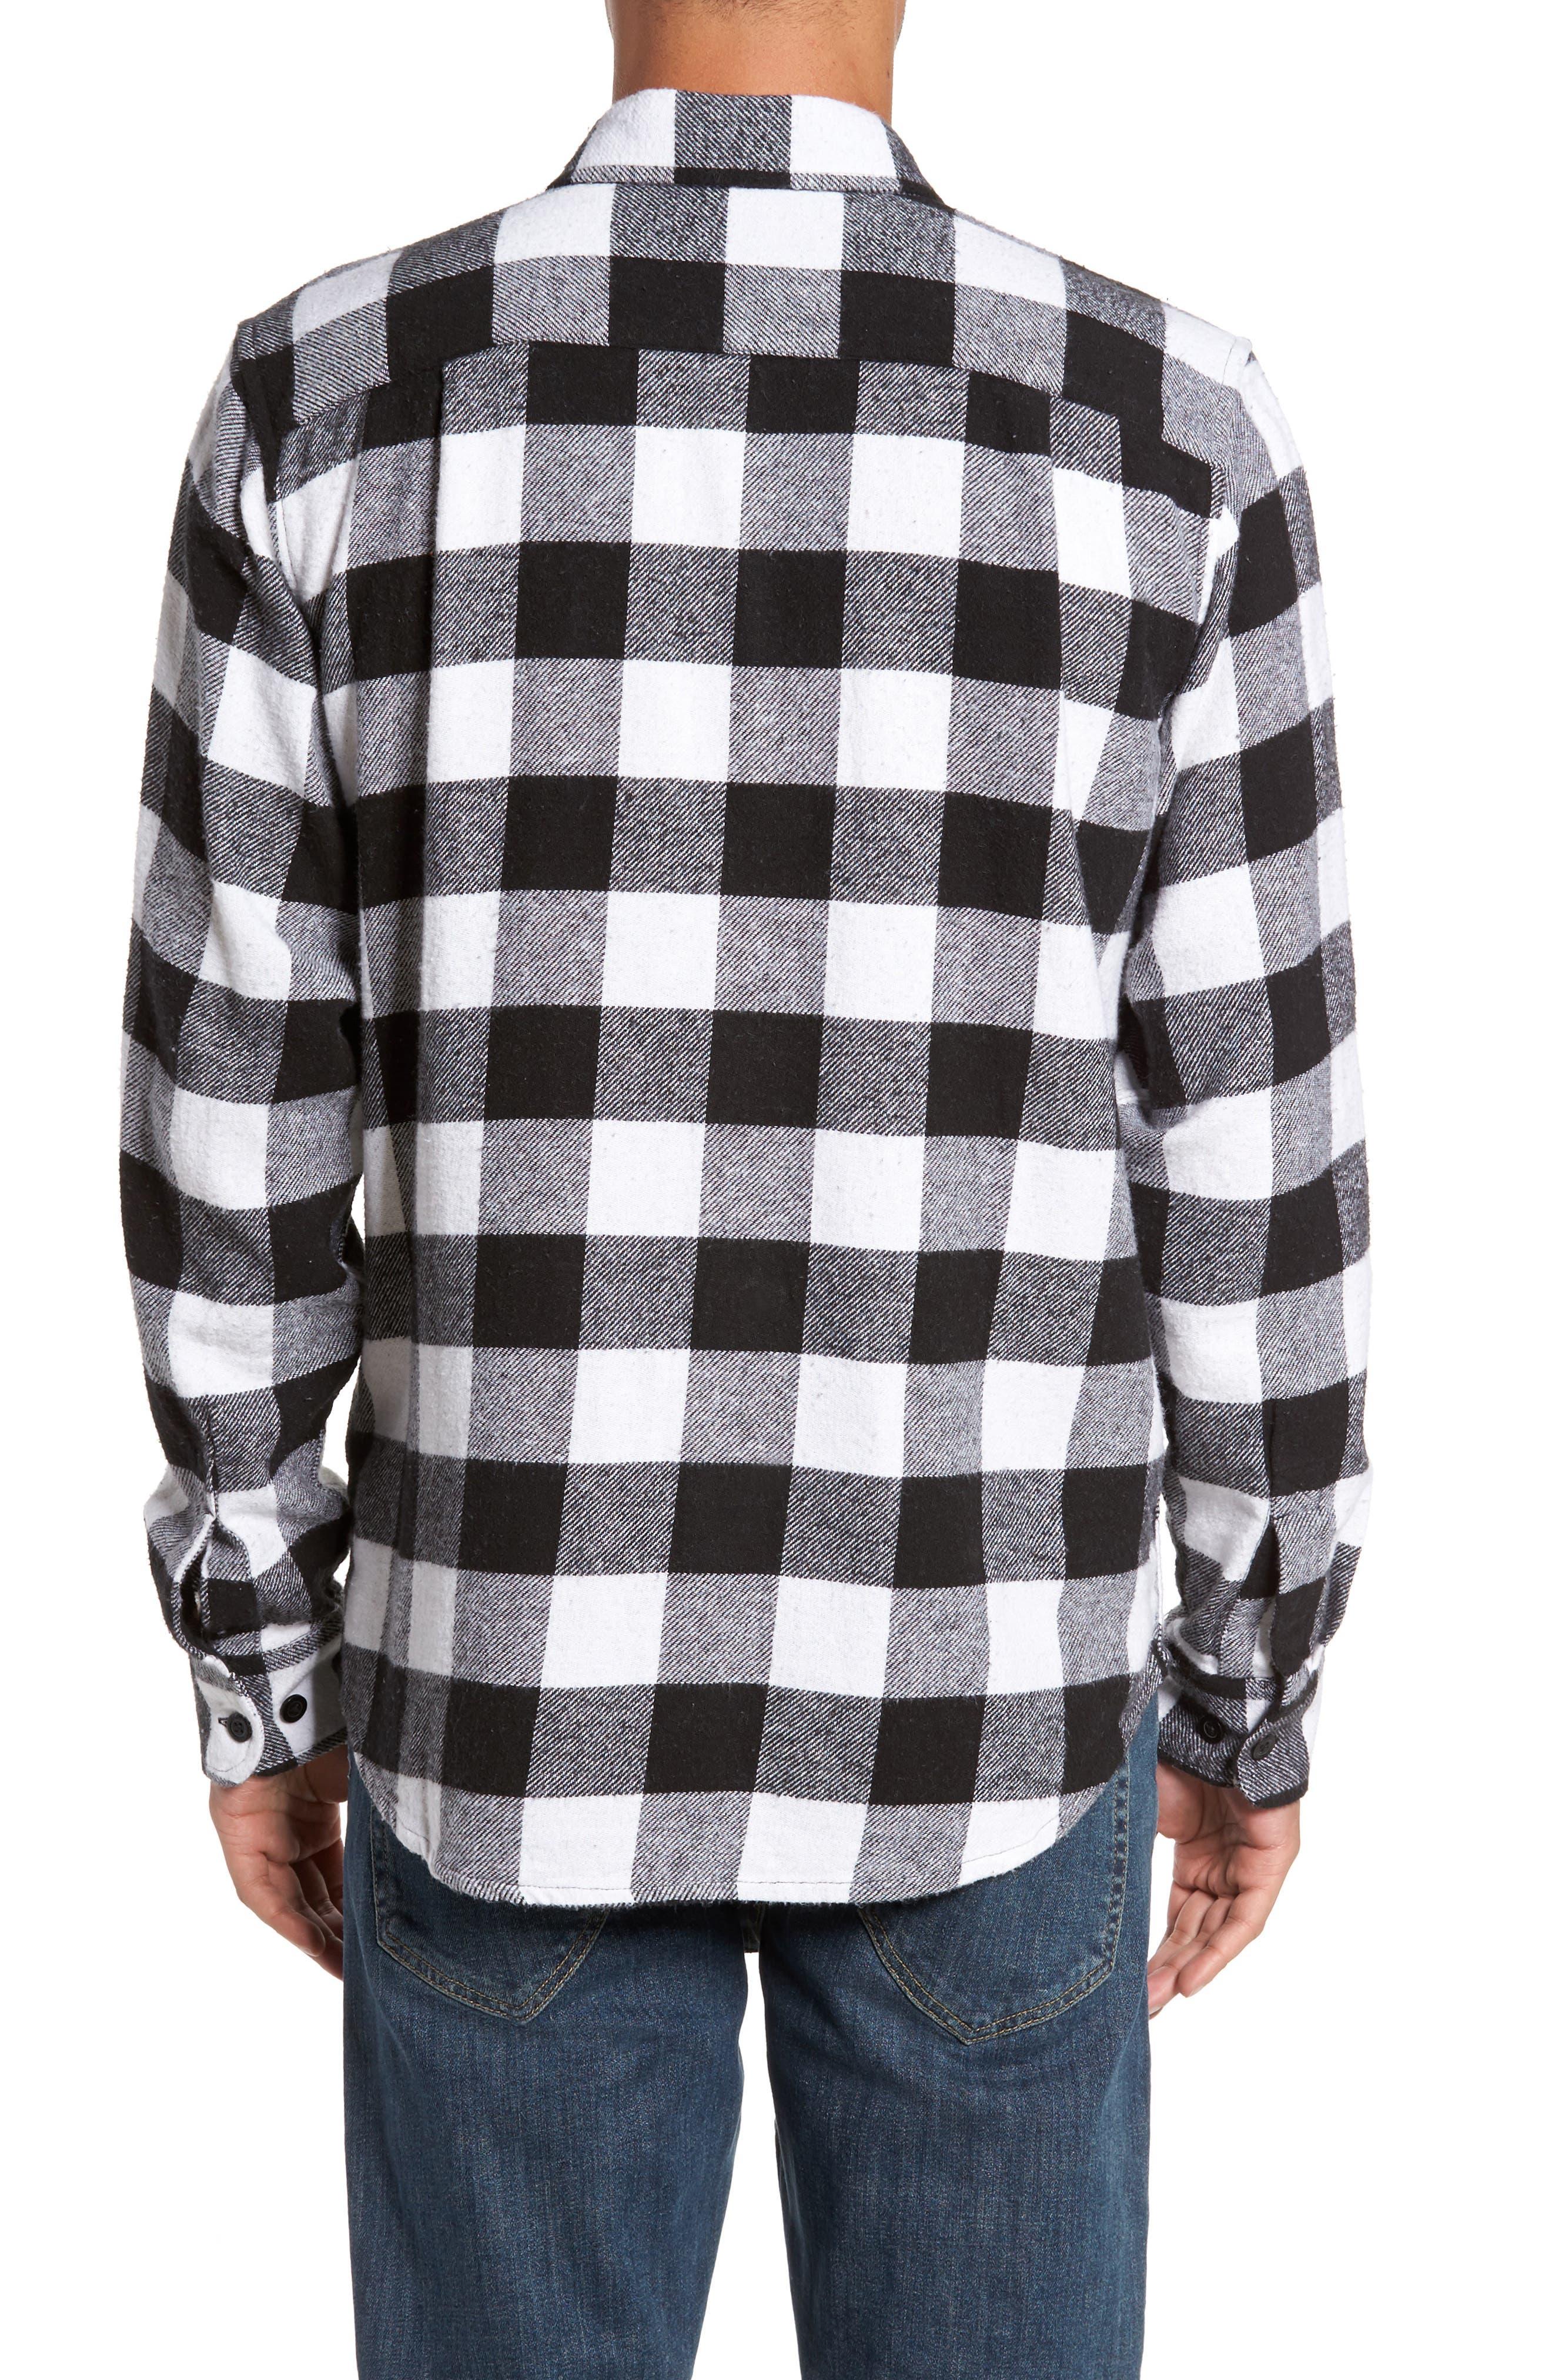 Trent Check Woven Shirt,                             Alternate thumbnail 2, color,                             002